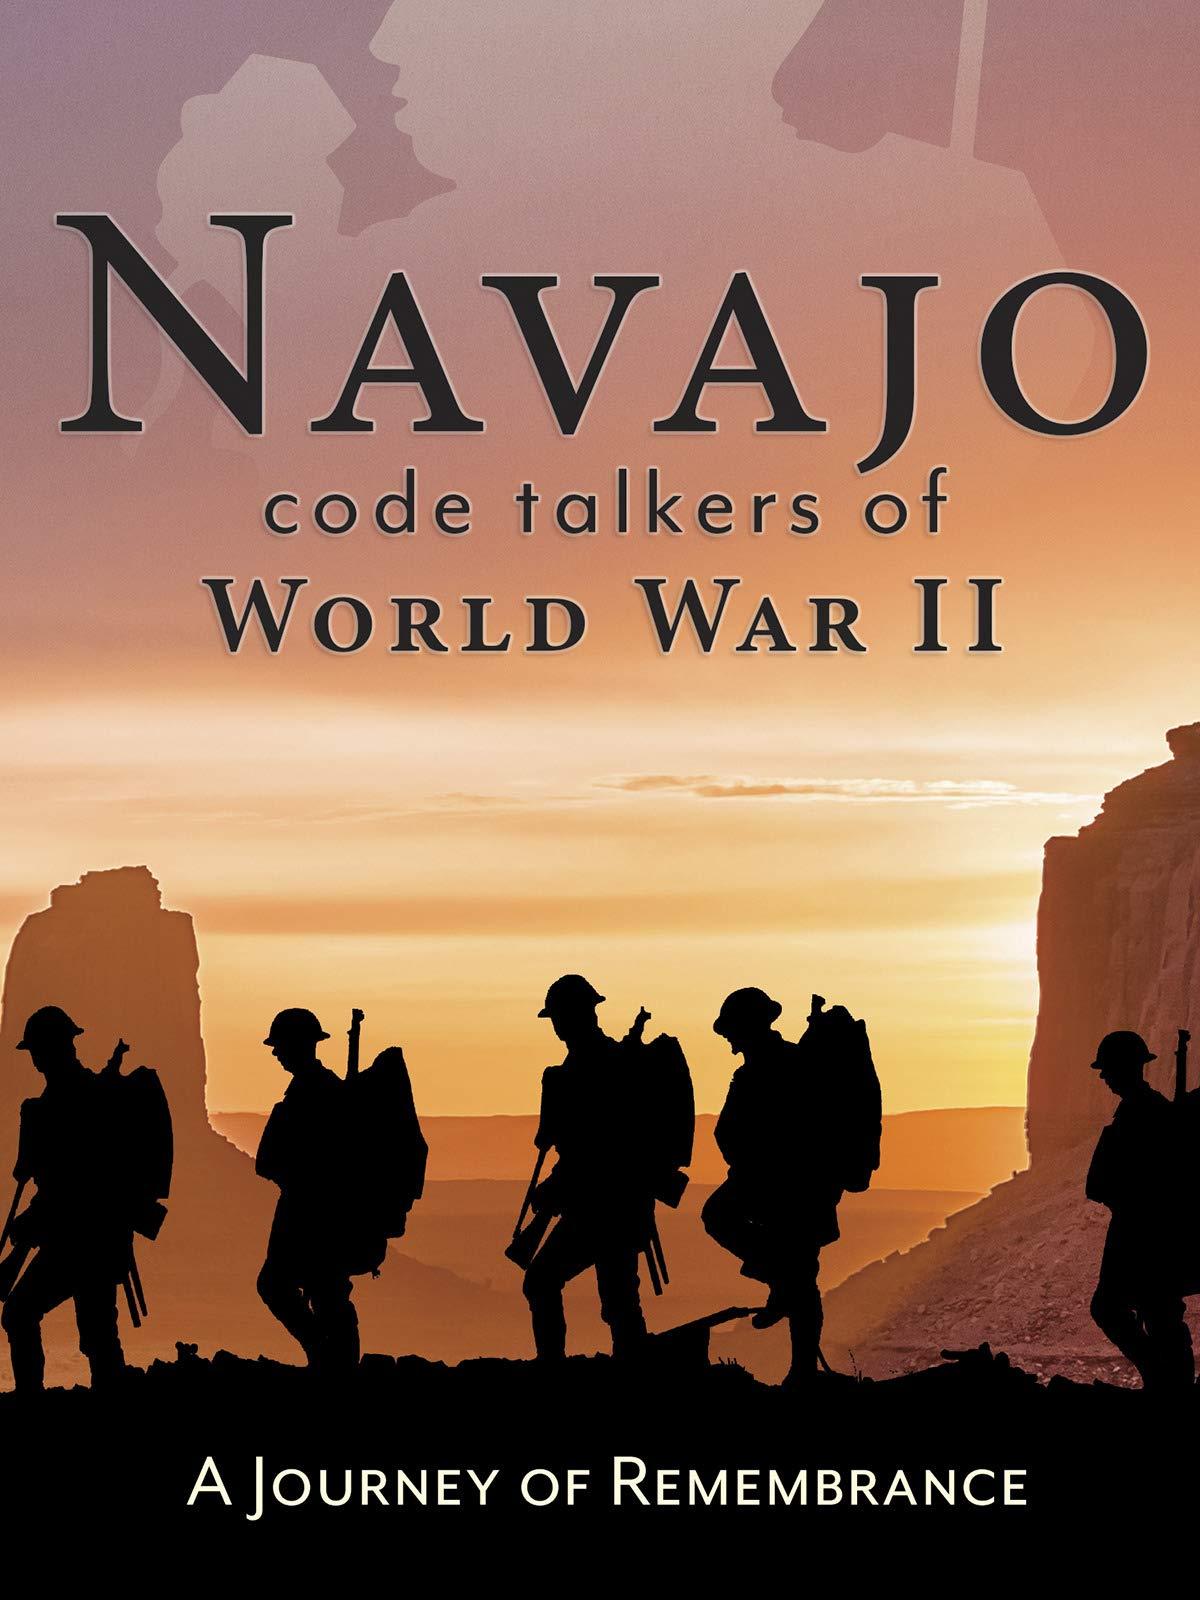 Navajo Code Talkers or World War II